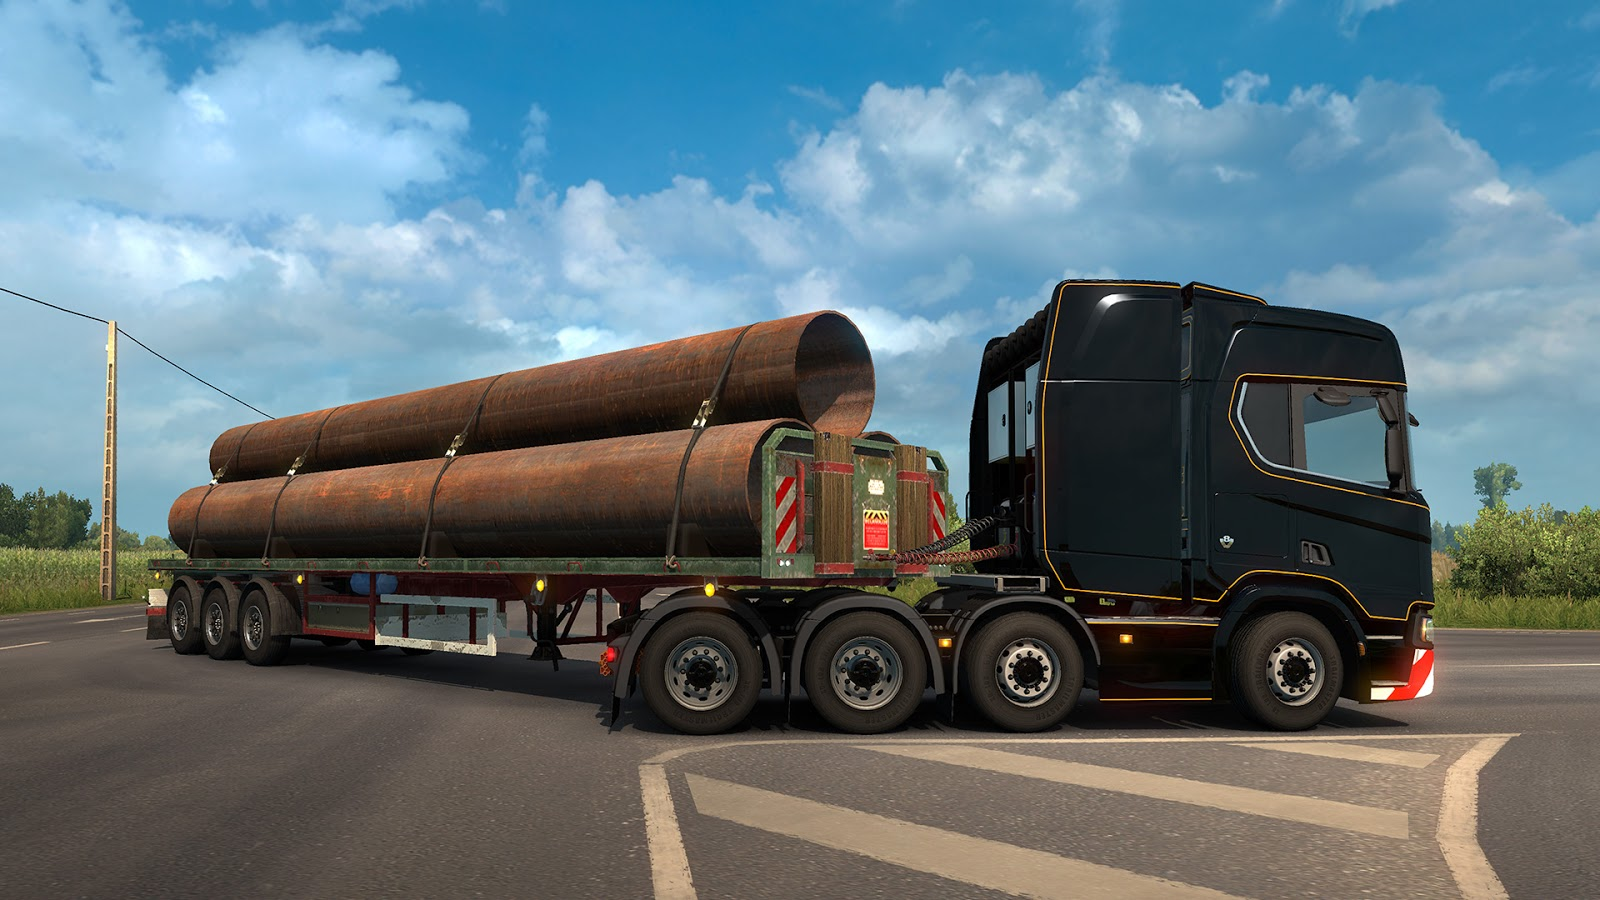 Euro Truck Simulator 2 (Steam Key RU+CIS) 2019